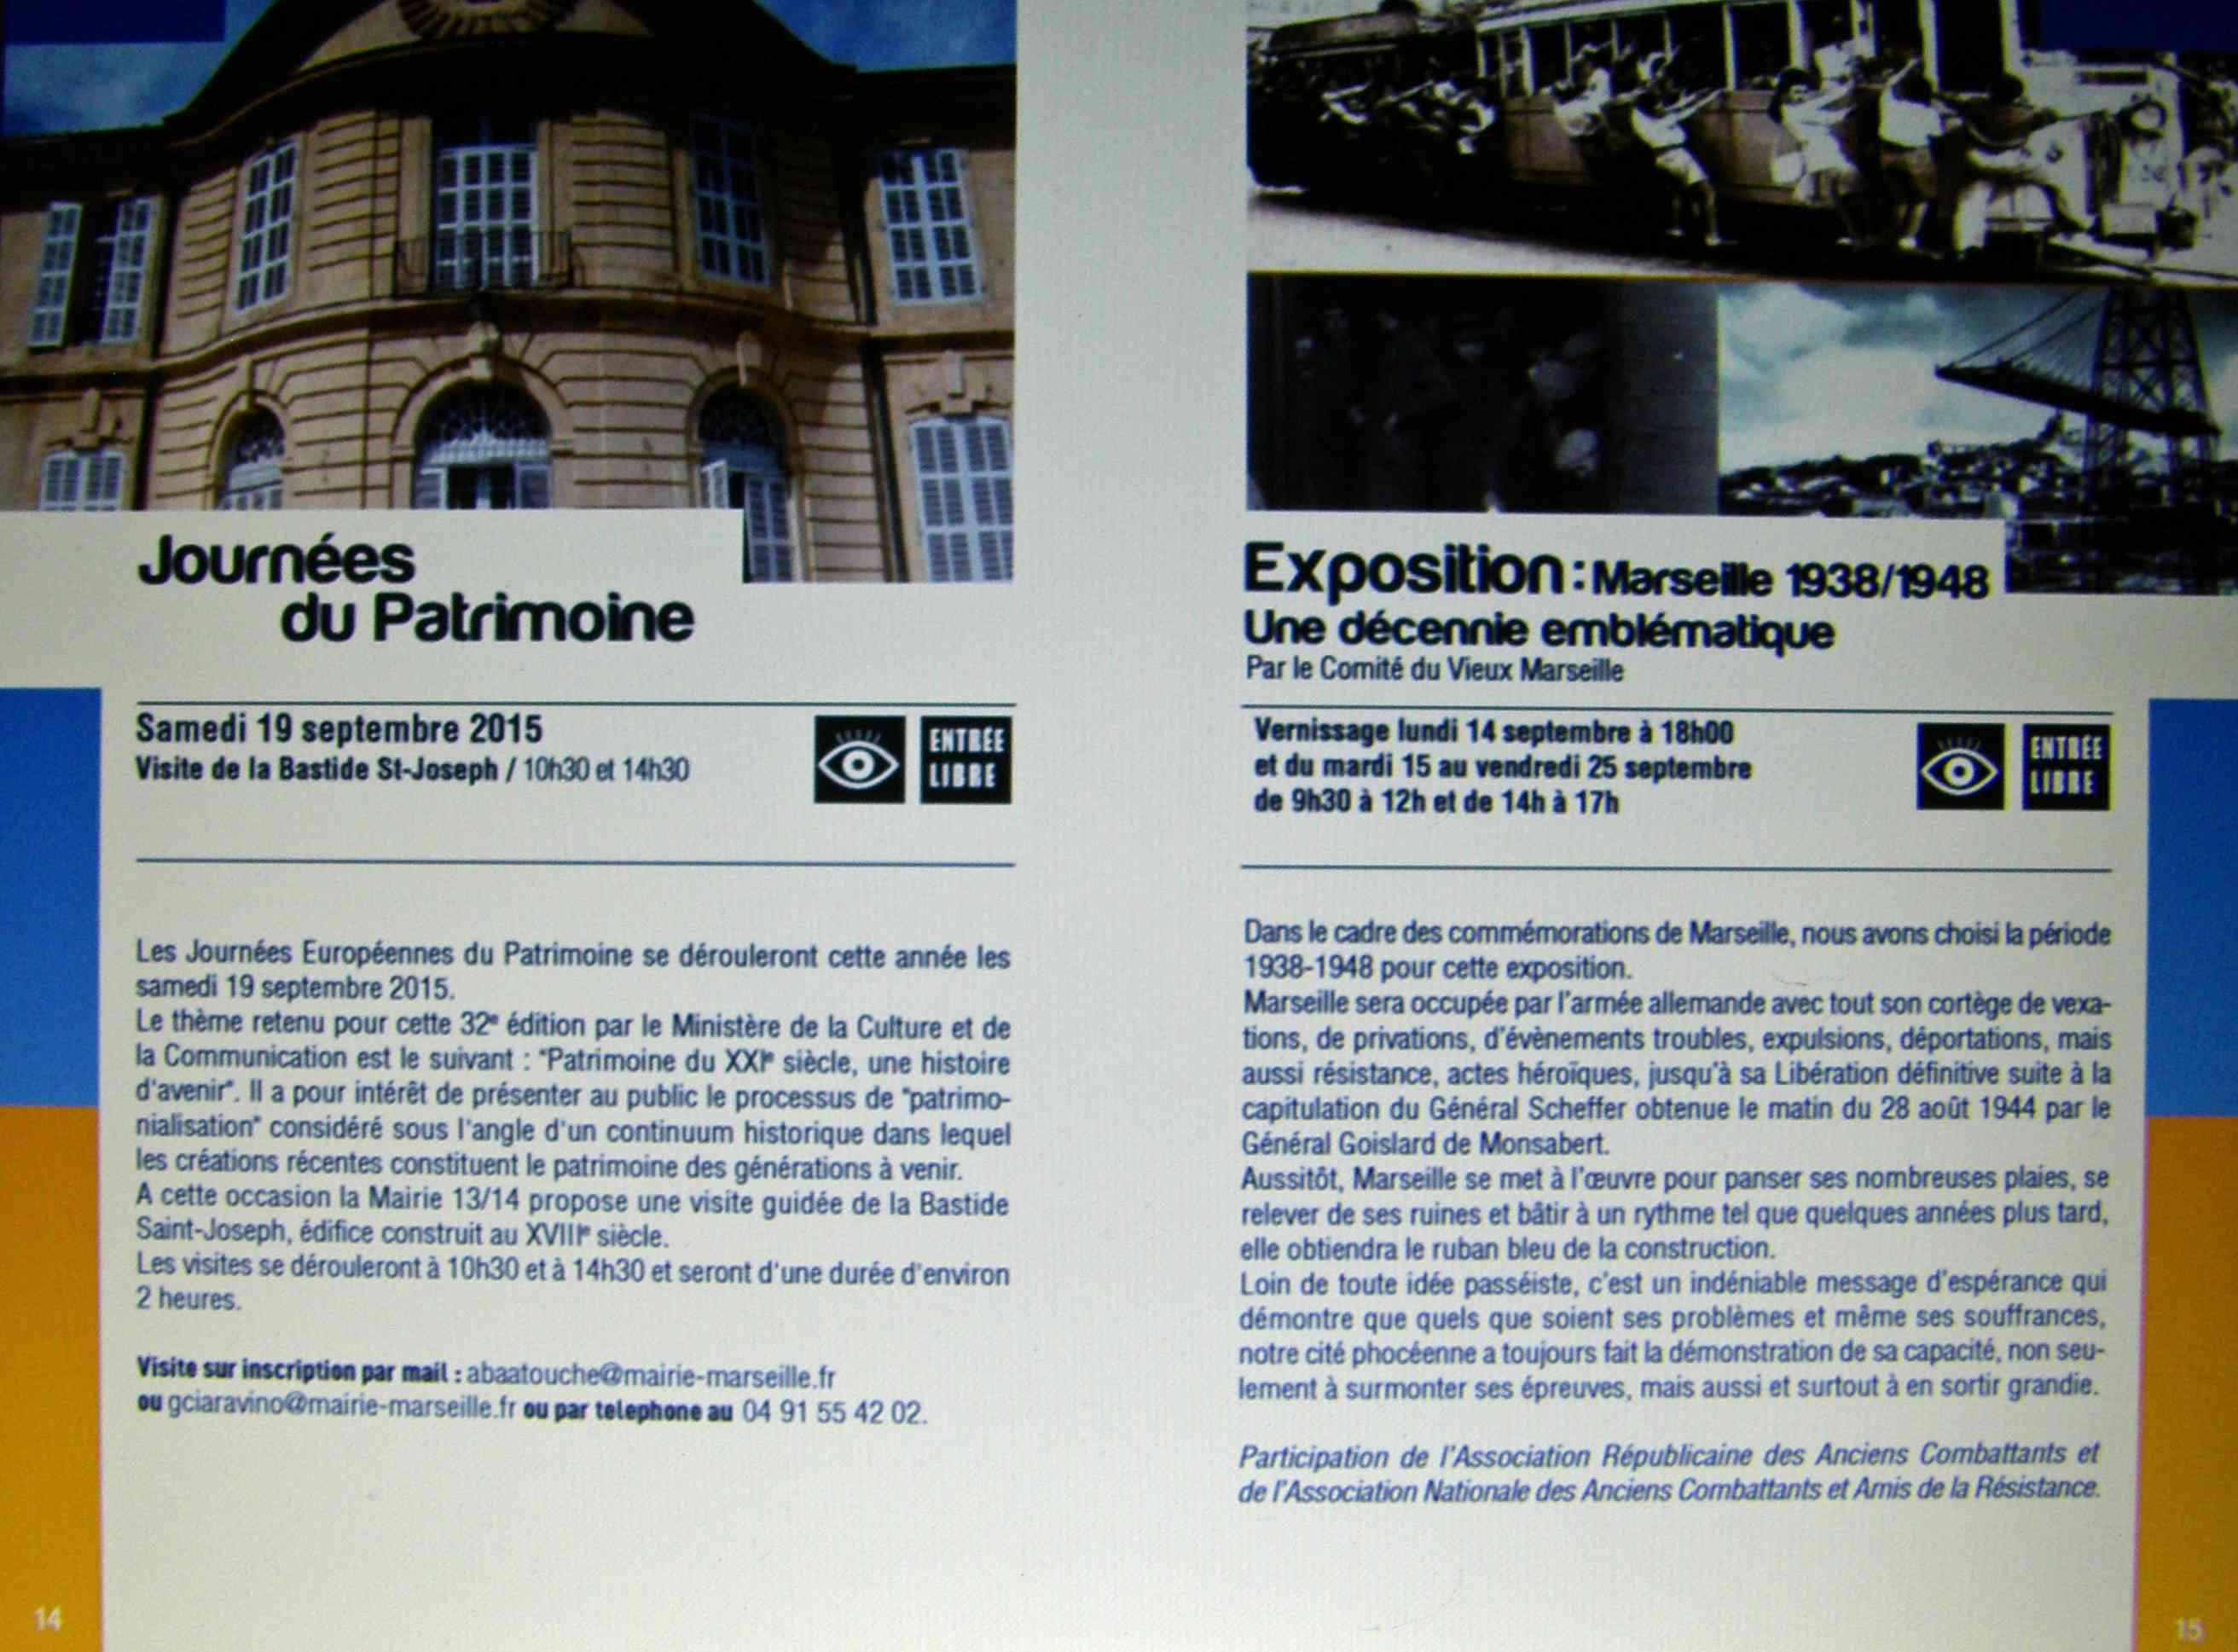 expo_m10.jpg